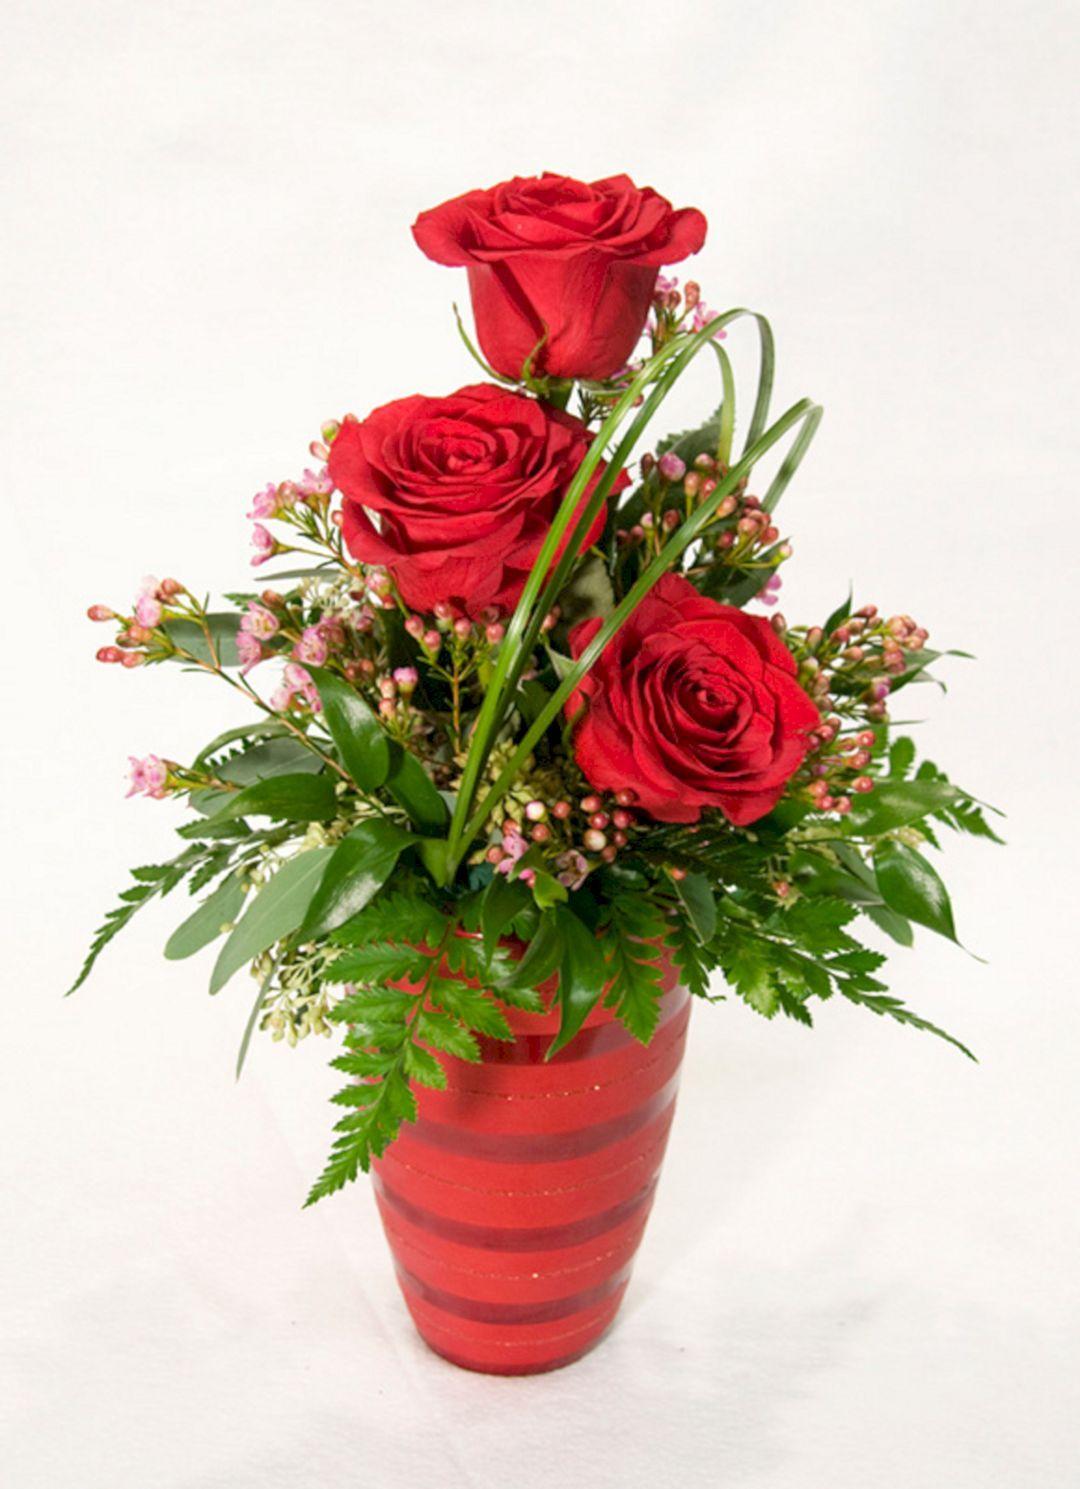 35 beautiful valentine floral arrangements ideas for your beloved 35 beautiful valentine floral arrangements ideas for your beloved people izmirmasajfo